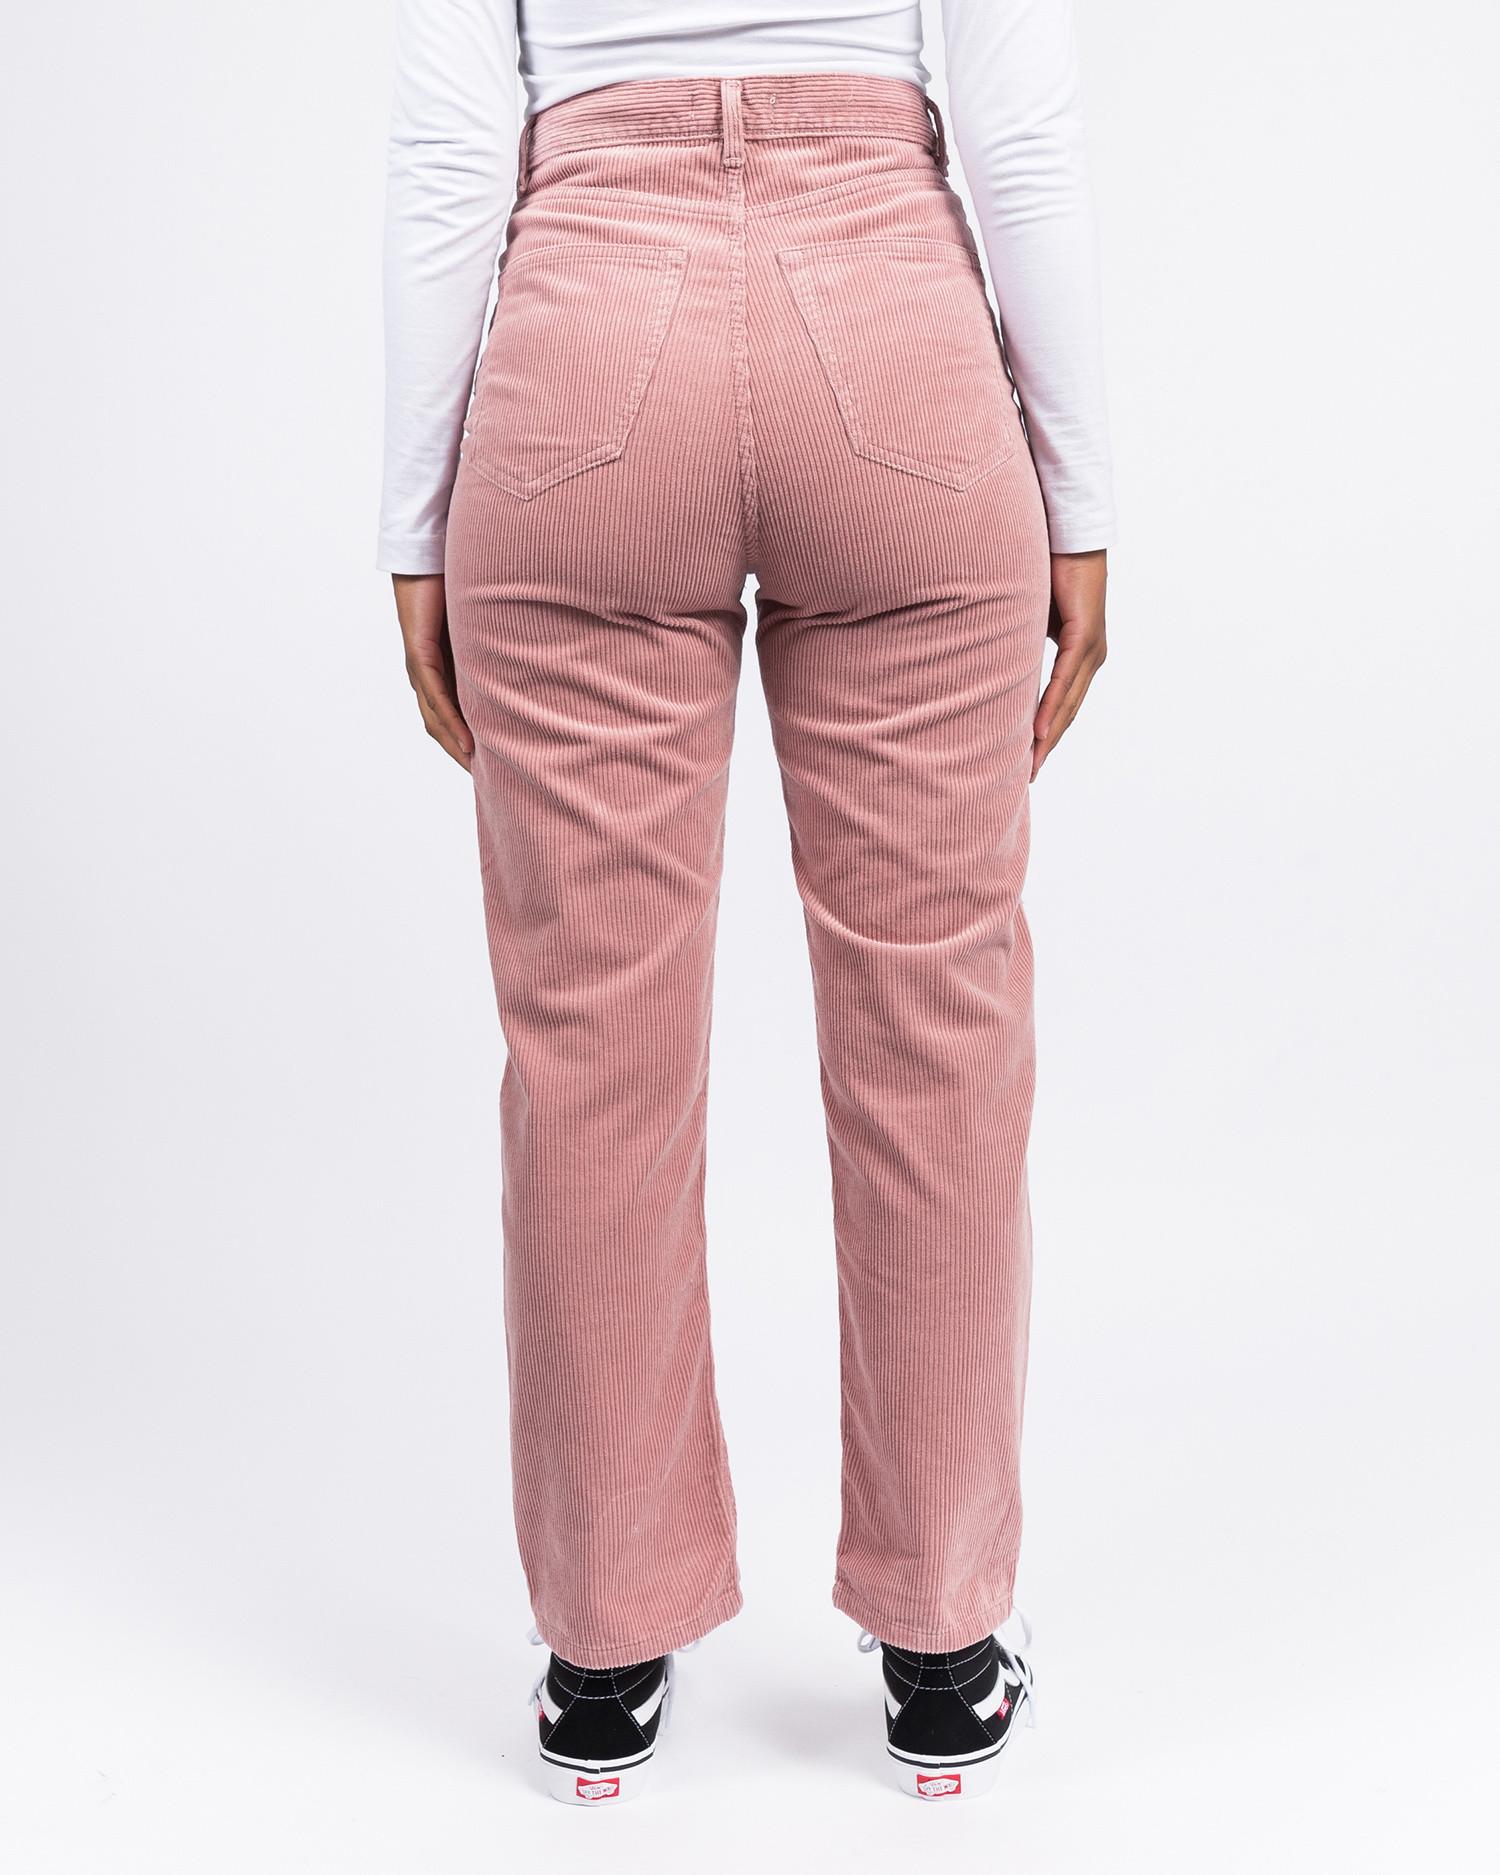 Carhartt W' Newport Pant Blush Rinsed